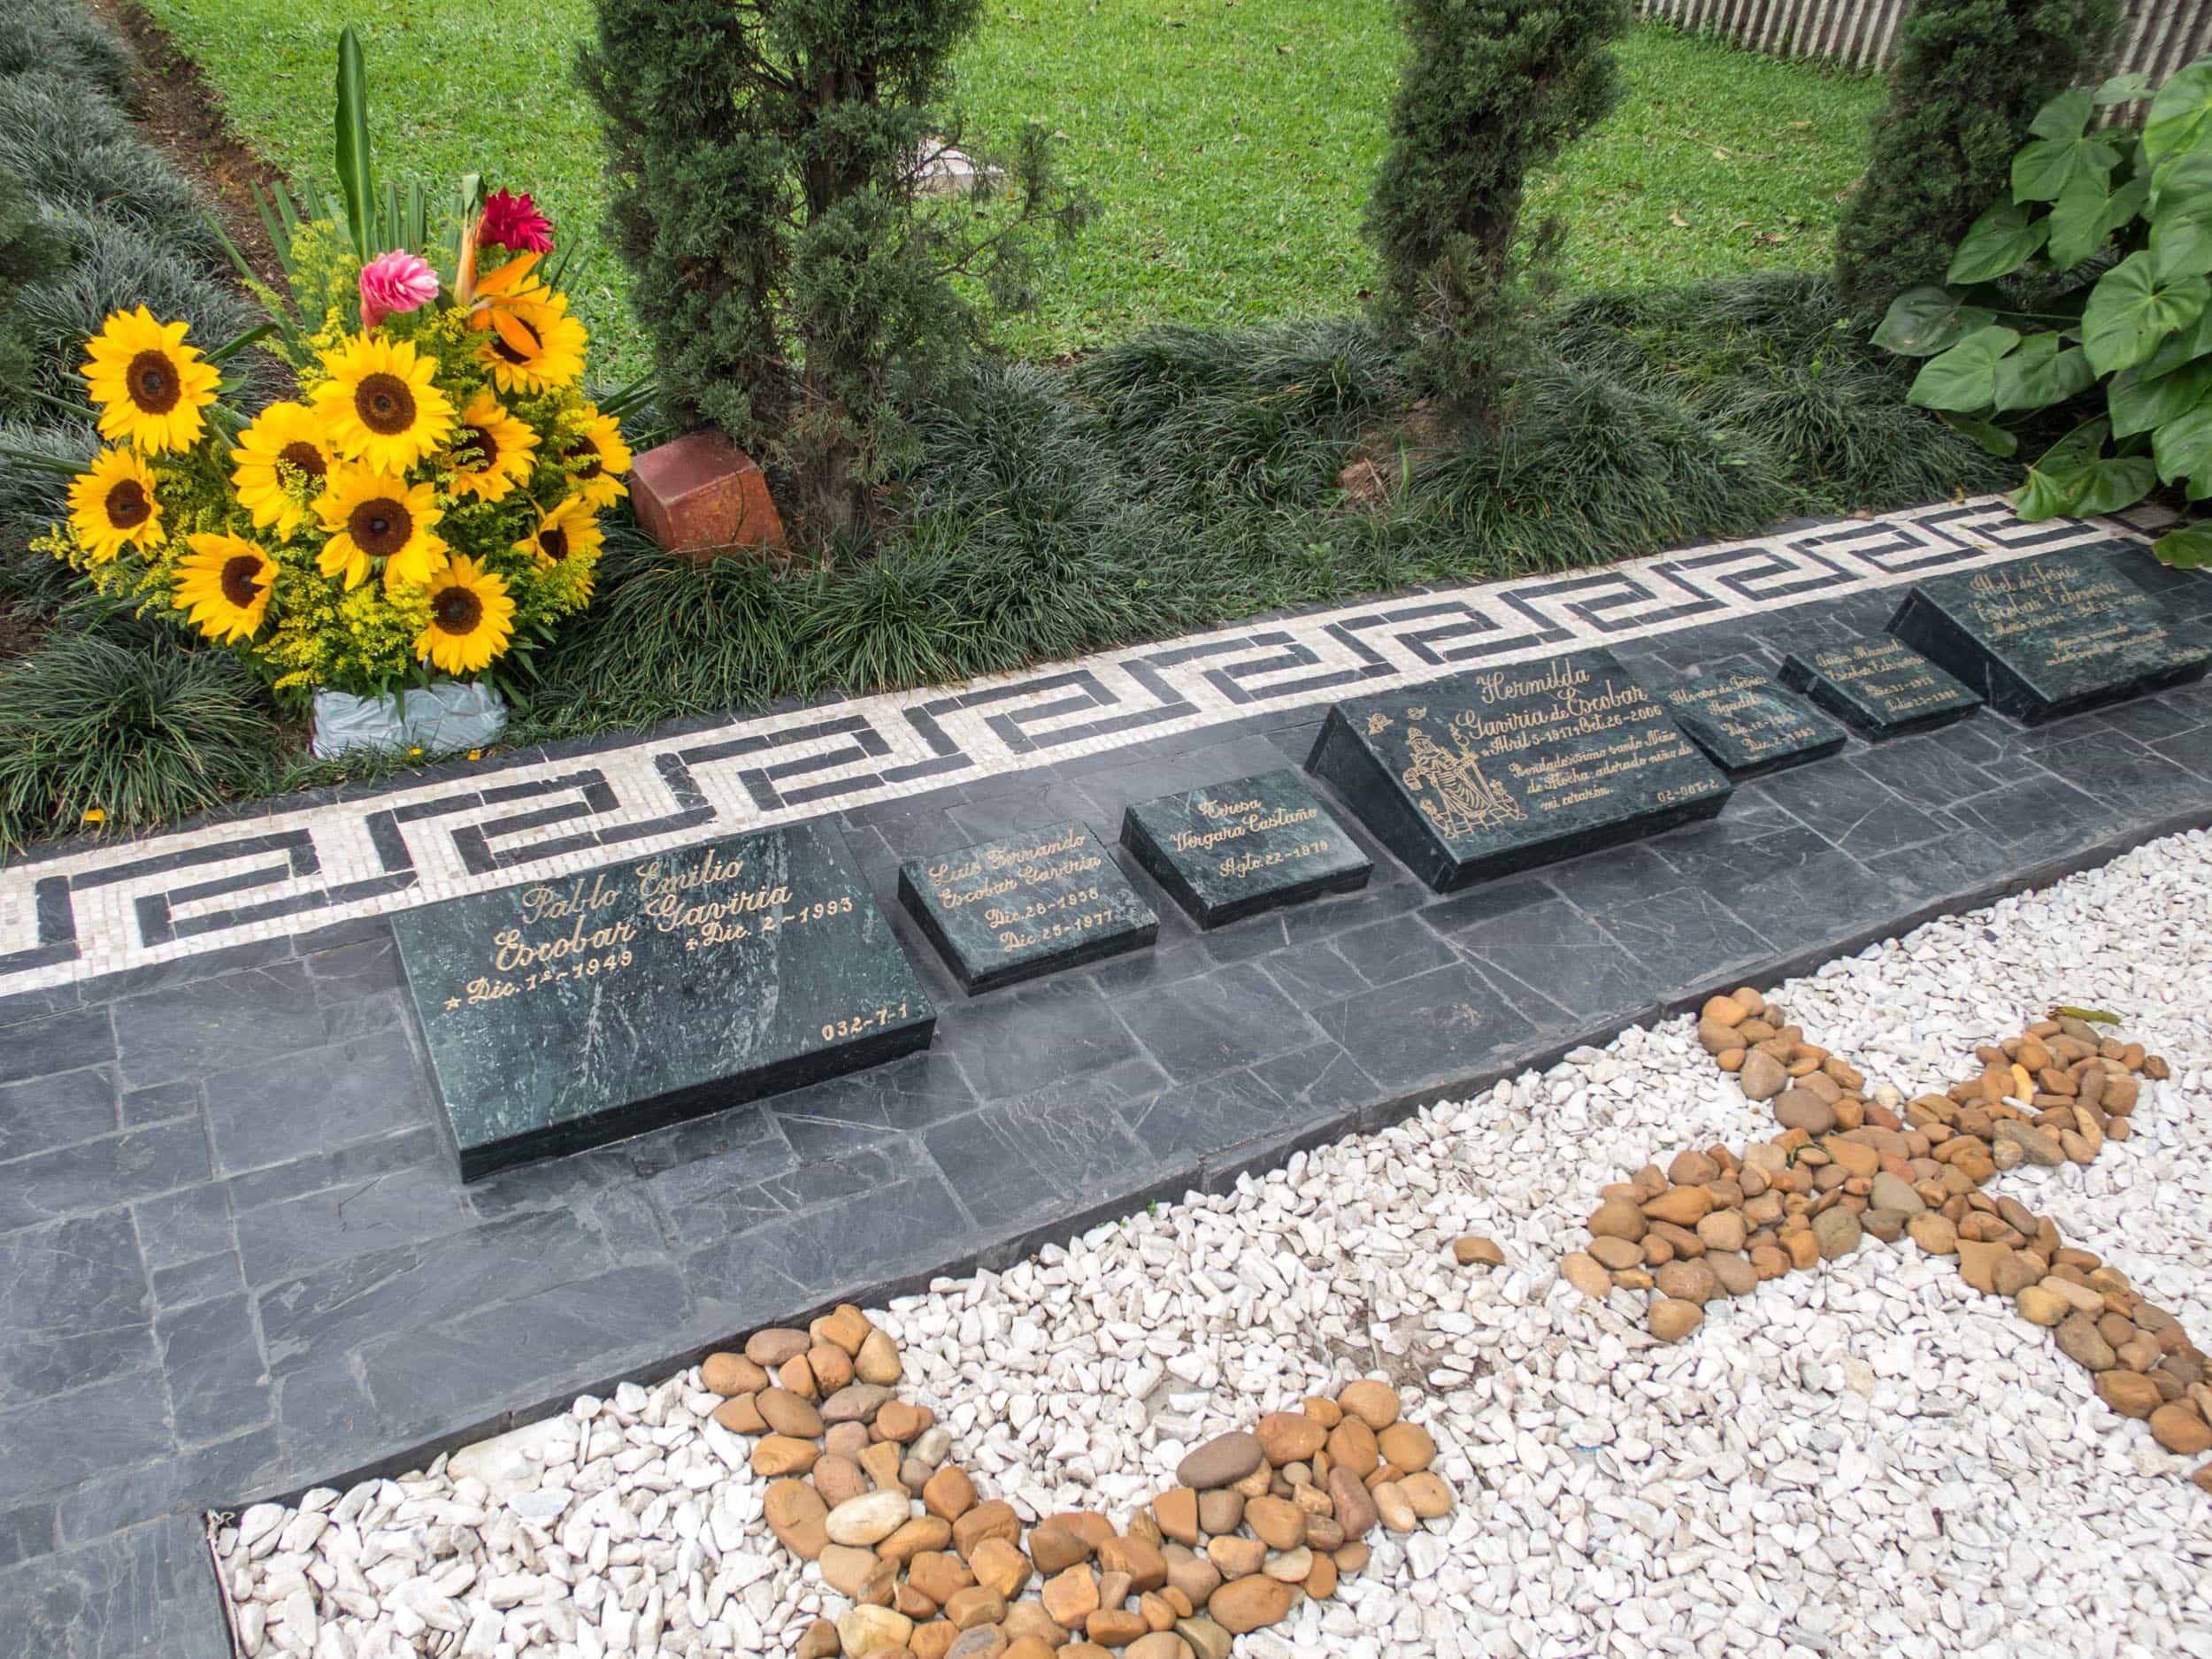 Pablo Escobar's family grave.